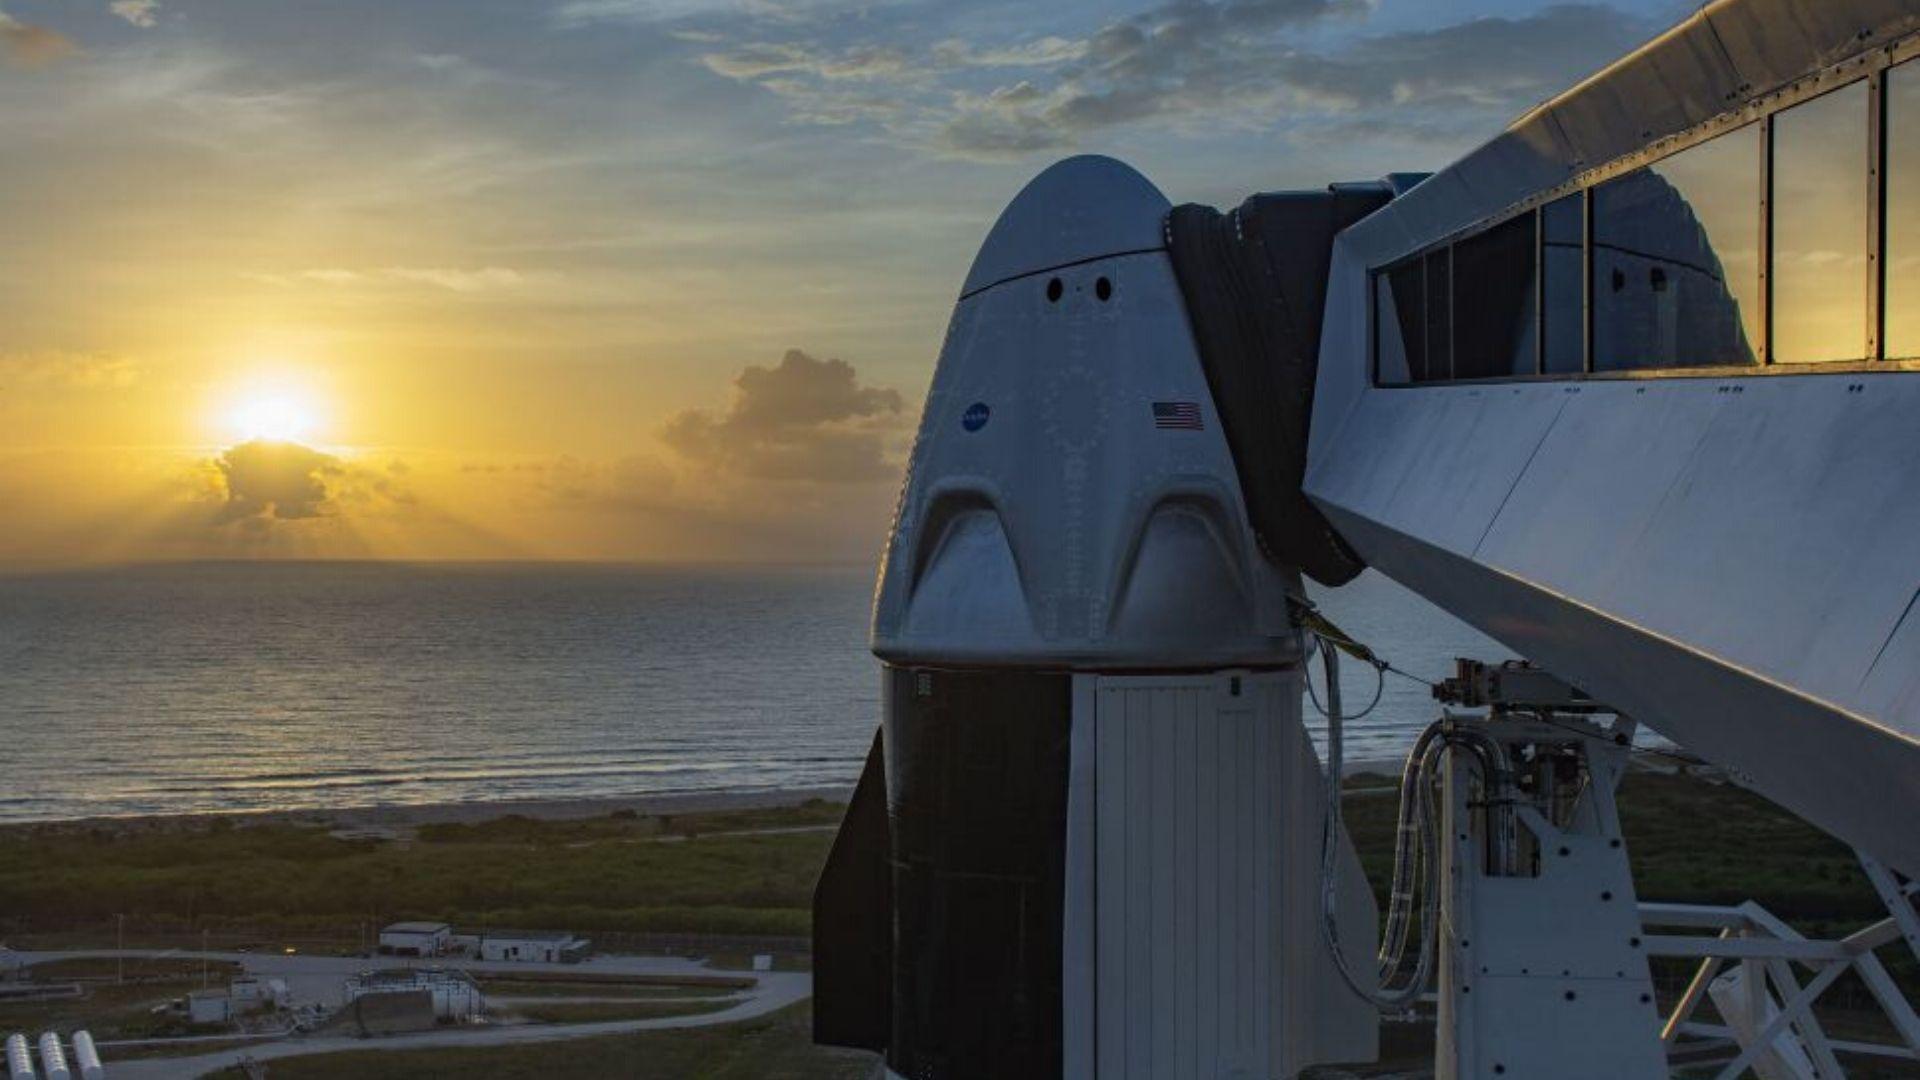 SpaceX-ის ისტორიული პილოტირებული ფრენა უამინდობის გამო გადაიდო • ForbesWoman